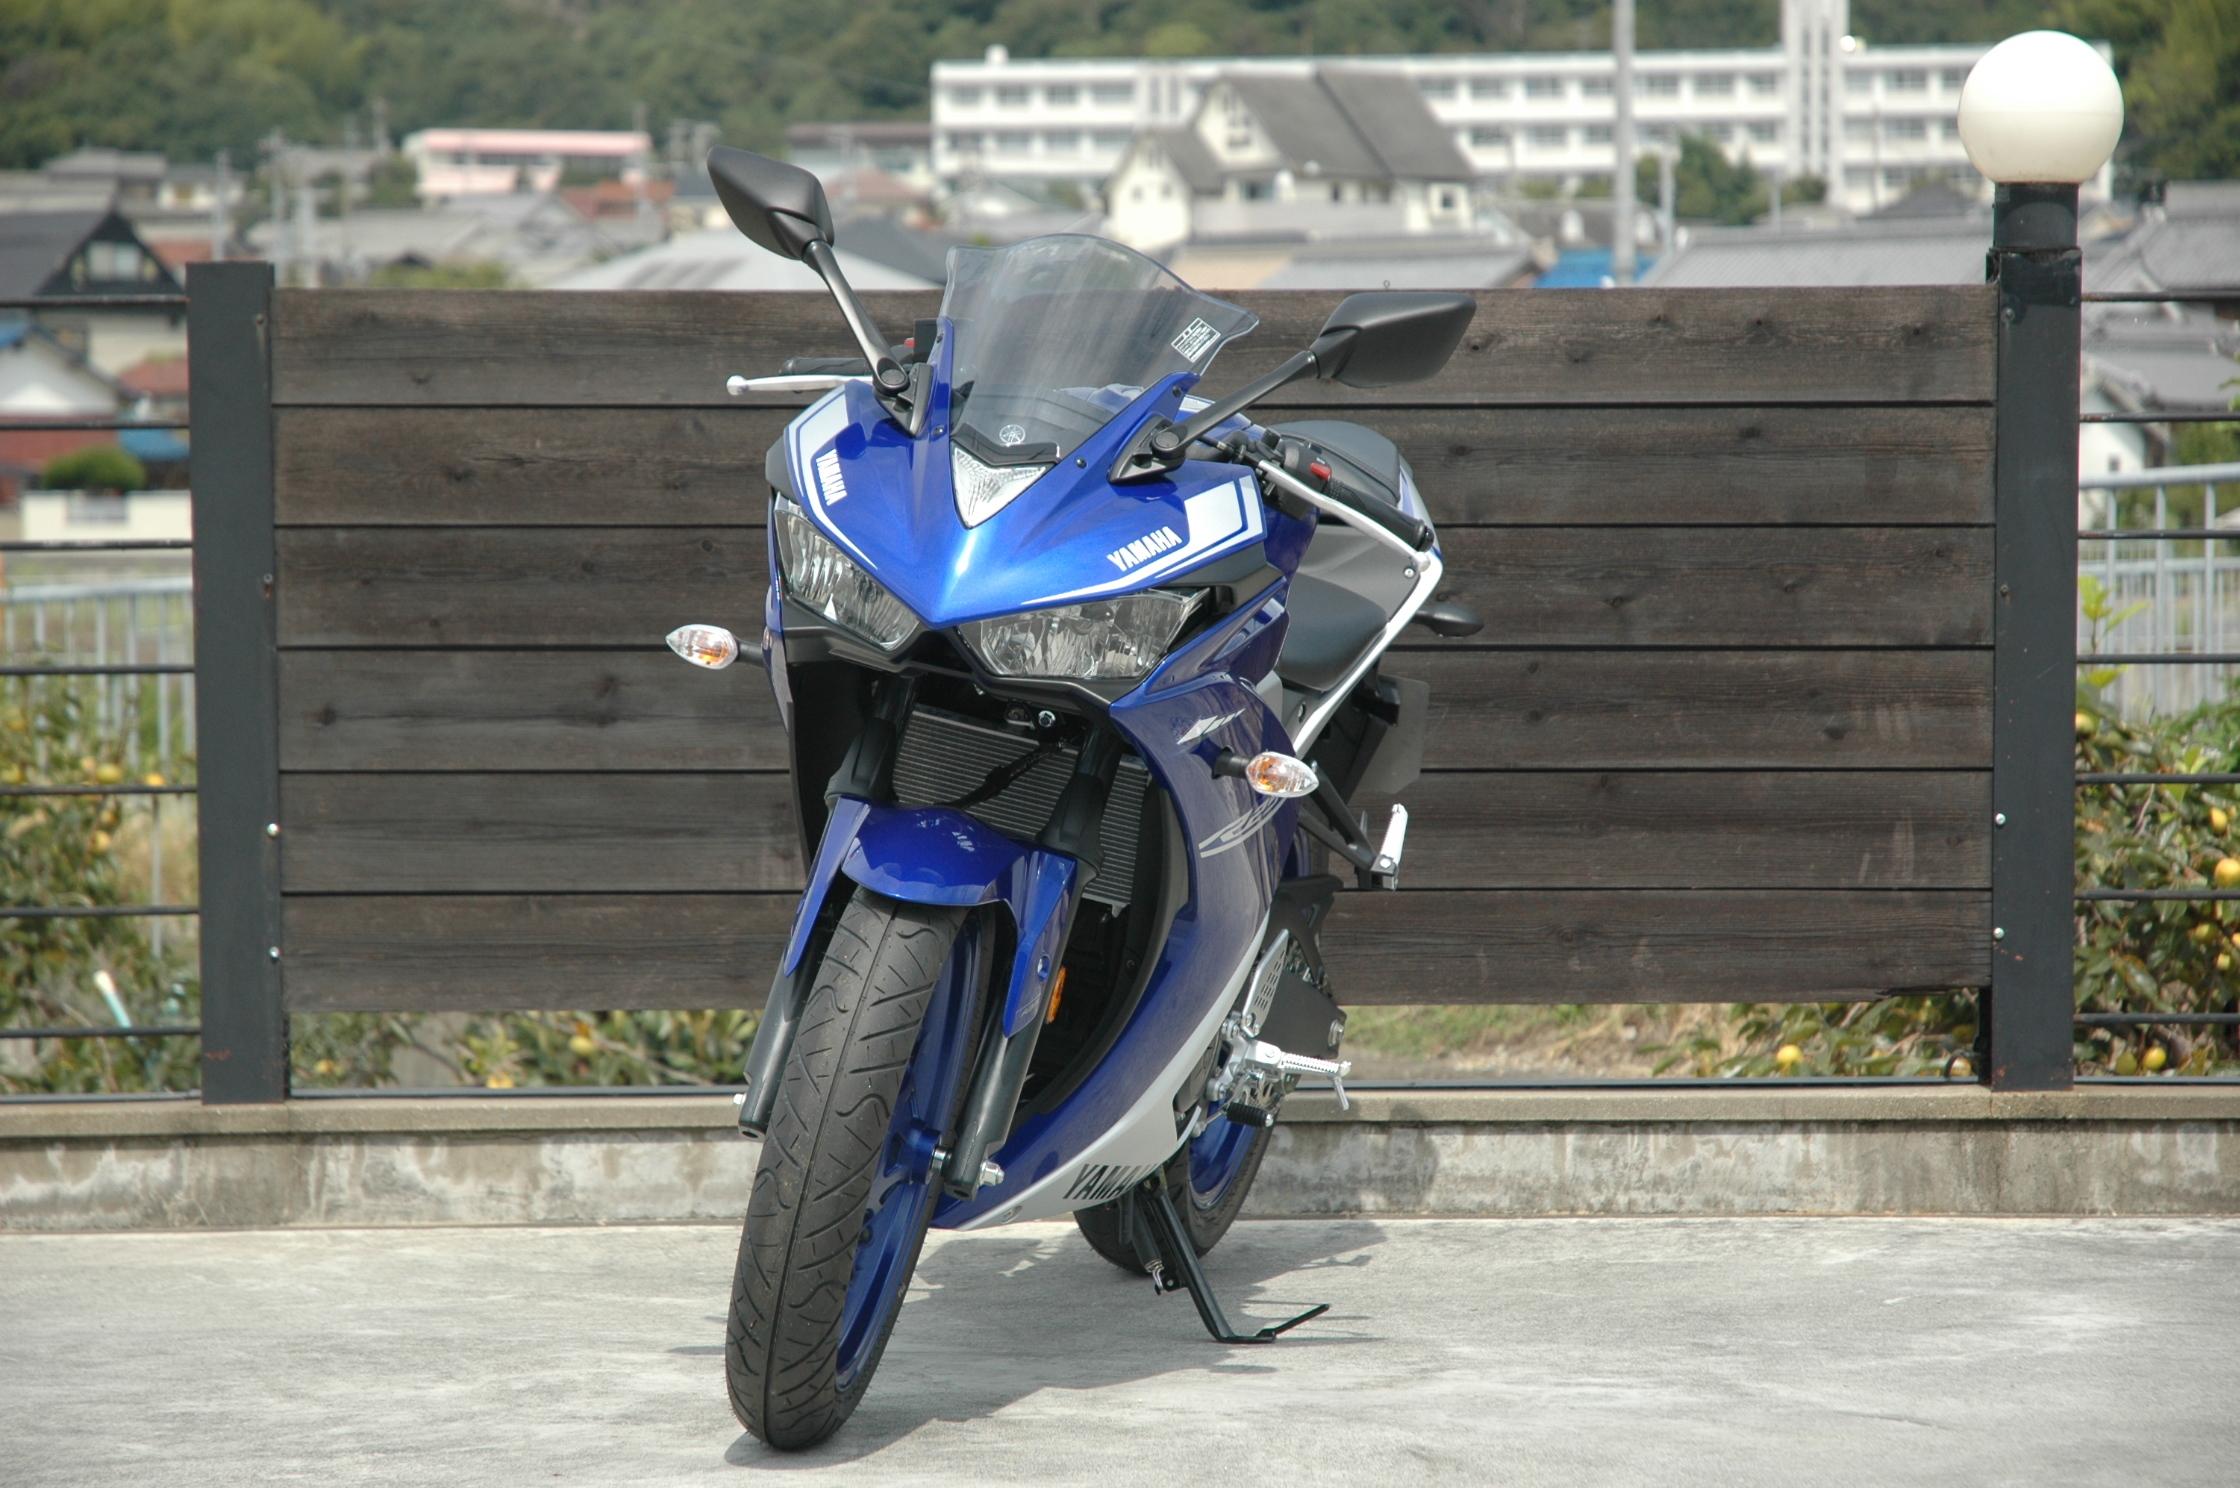 170915-r25-blue-3.jpg